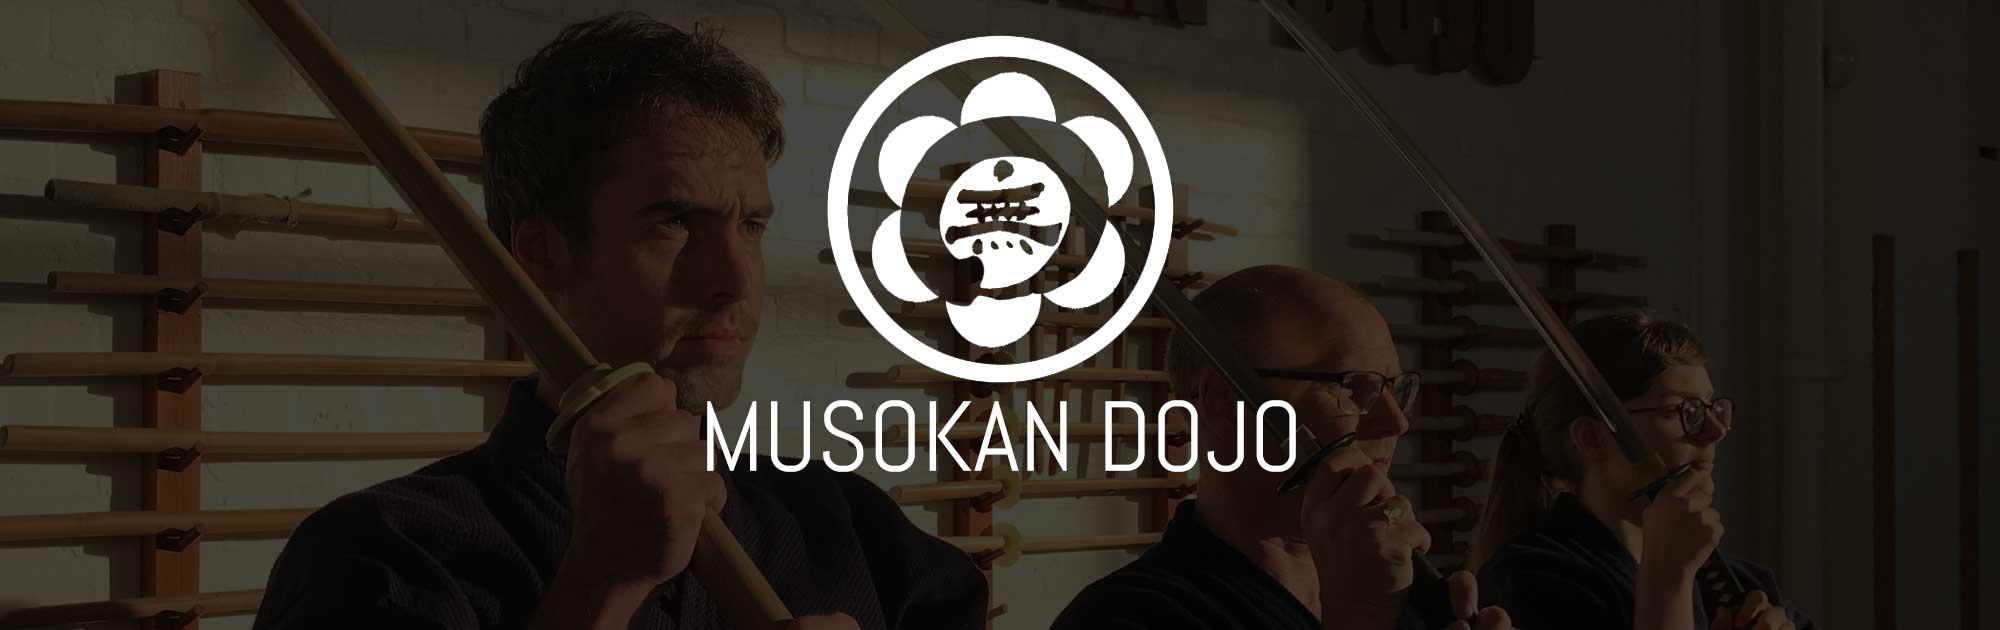 Musokan Dojo Logo Slide